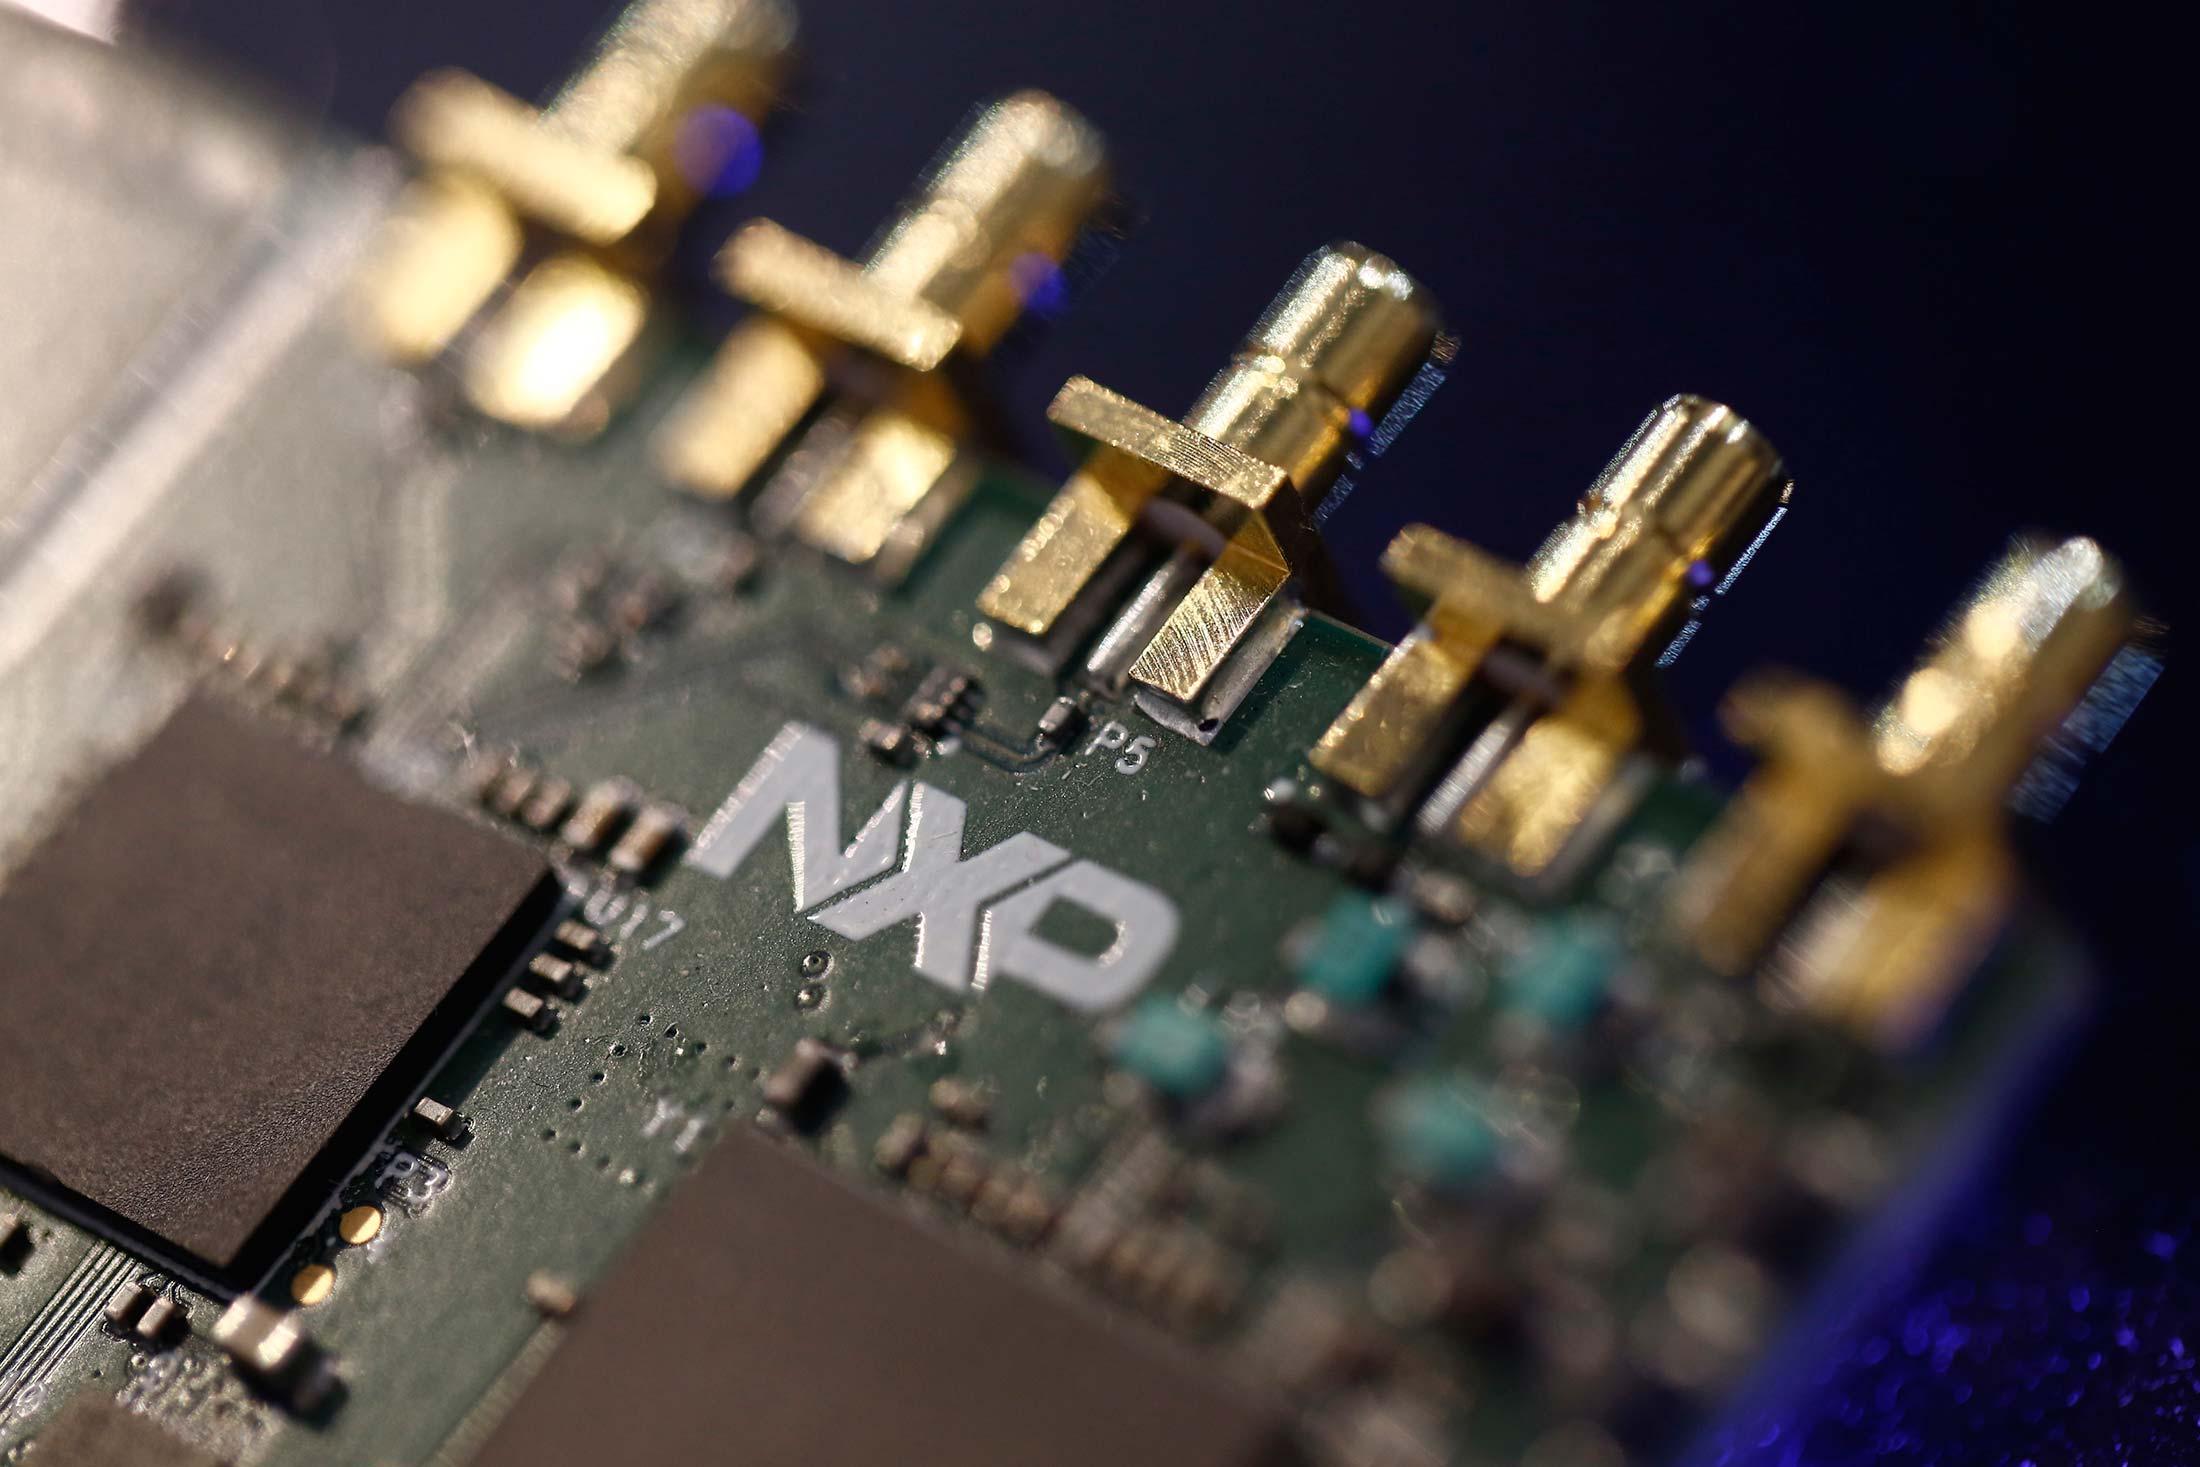 Nxpi Stock Quote Alluring Nxpinasdaq Gs Stock Quote  Nxp Semiconductors Nv  Bloomberg Markets